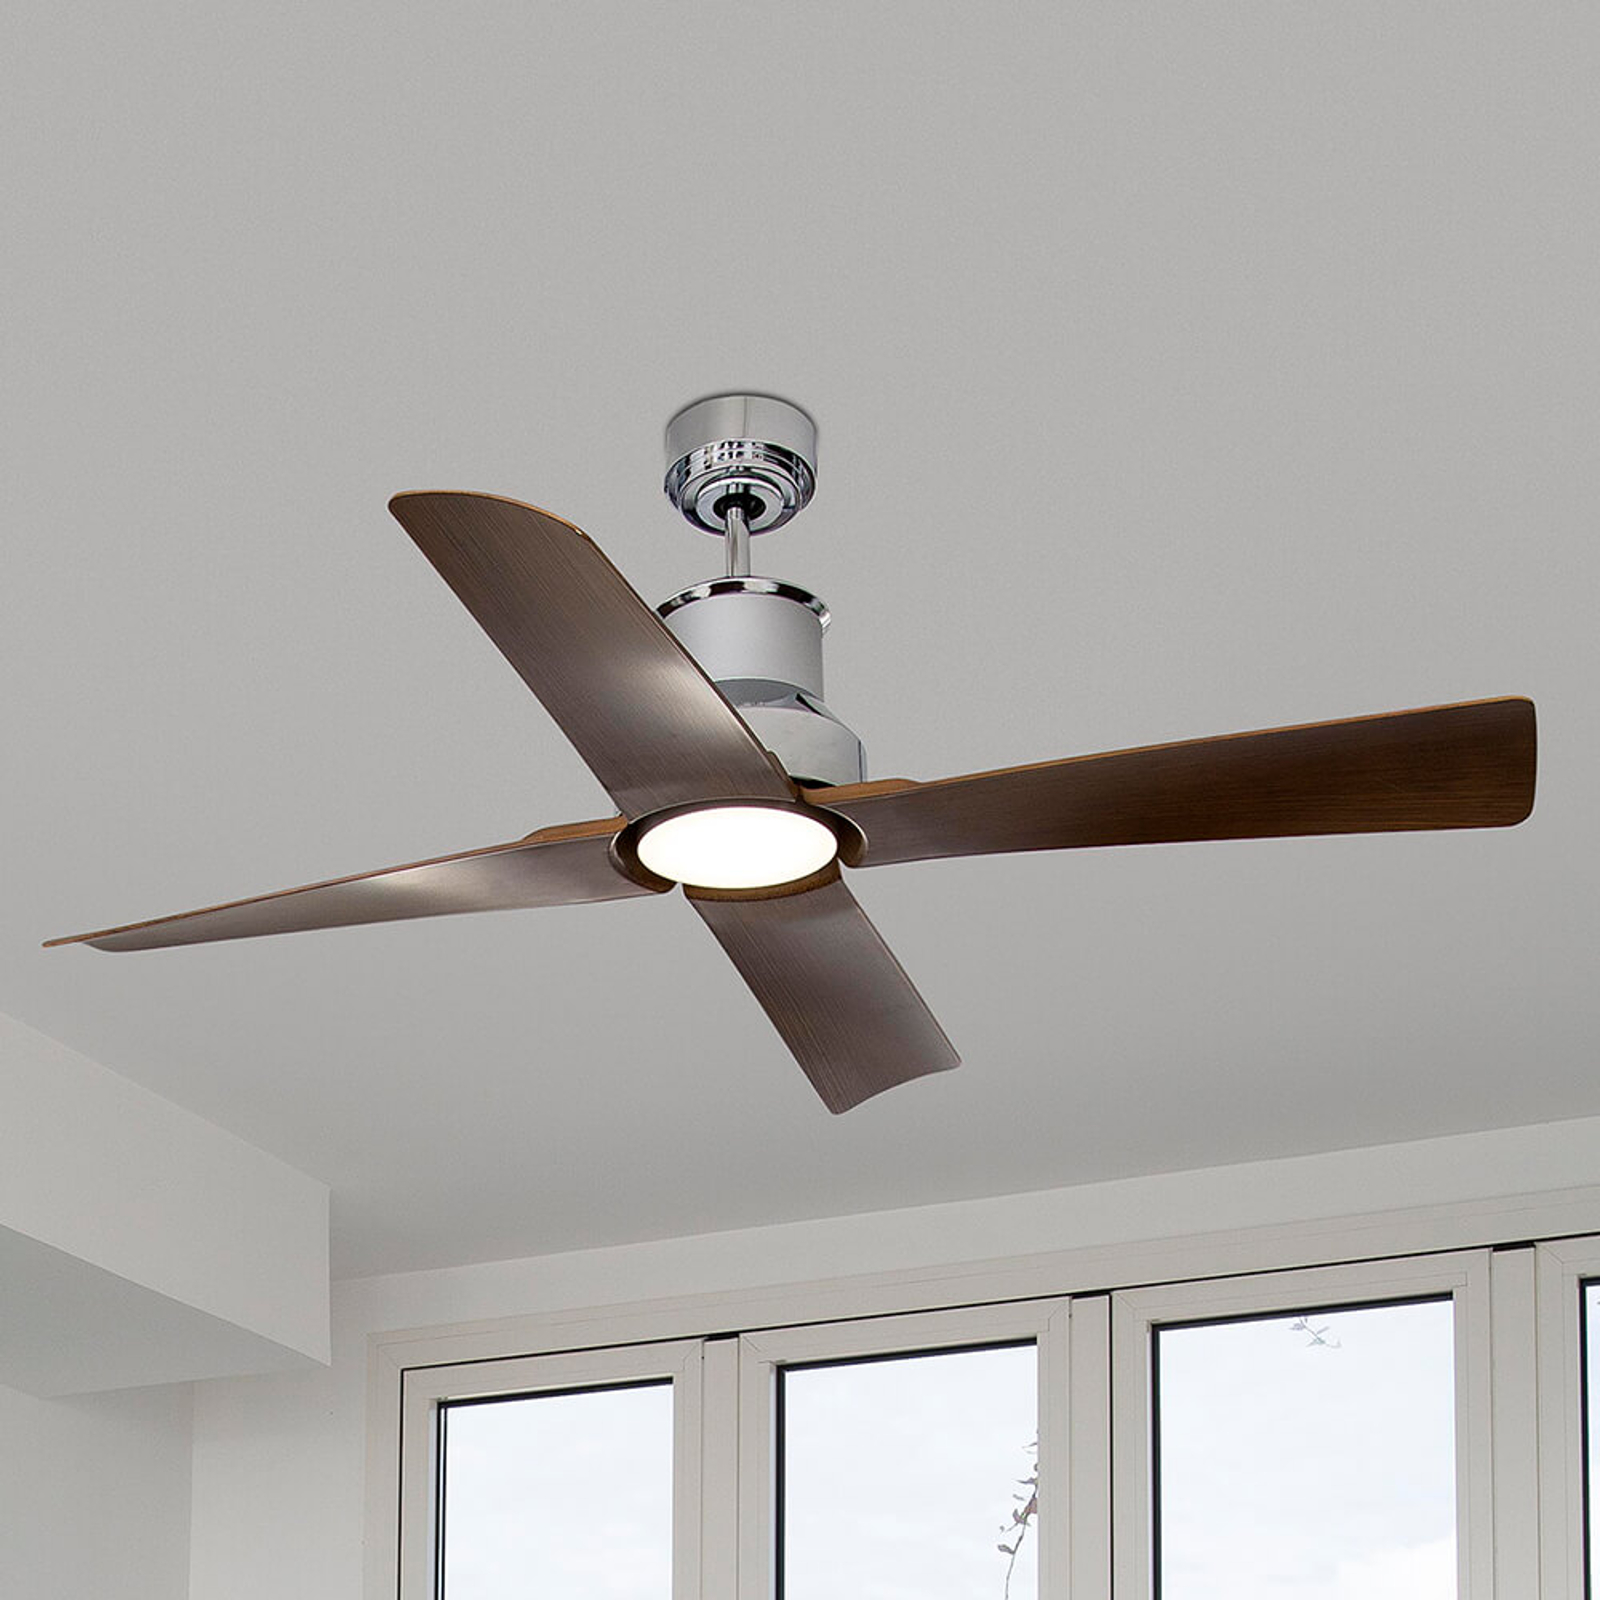 Opsigtsvækkende designet loftventilator Winche